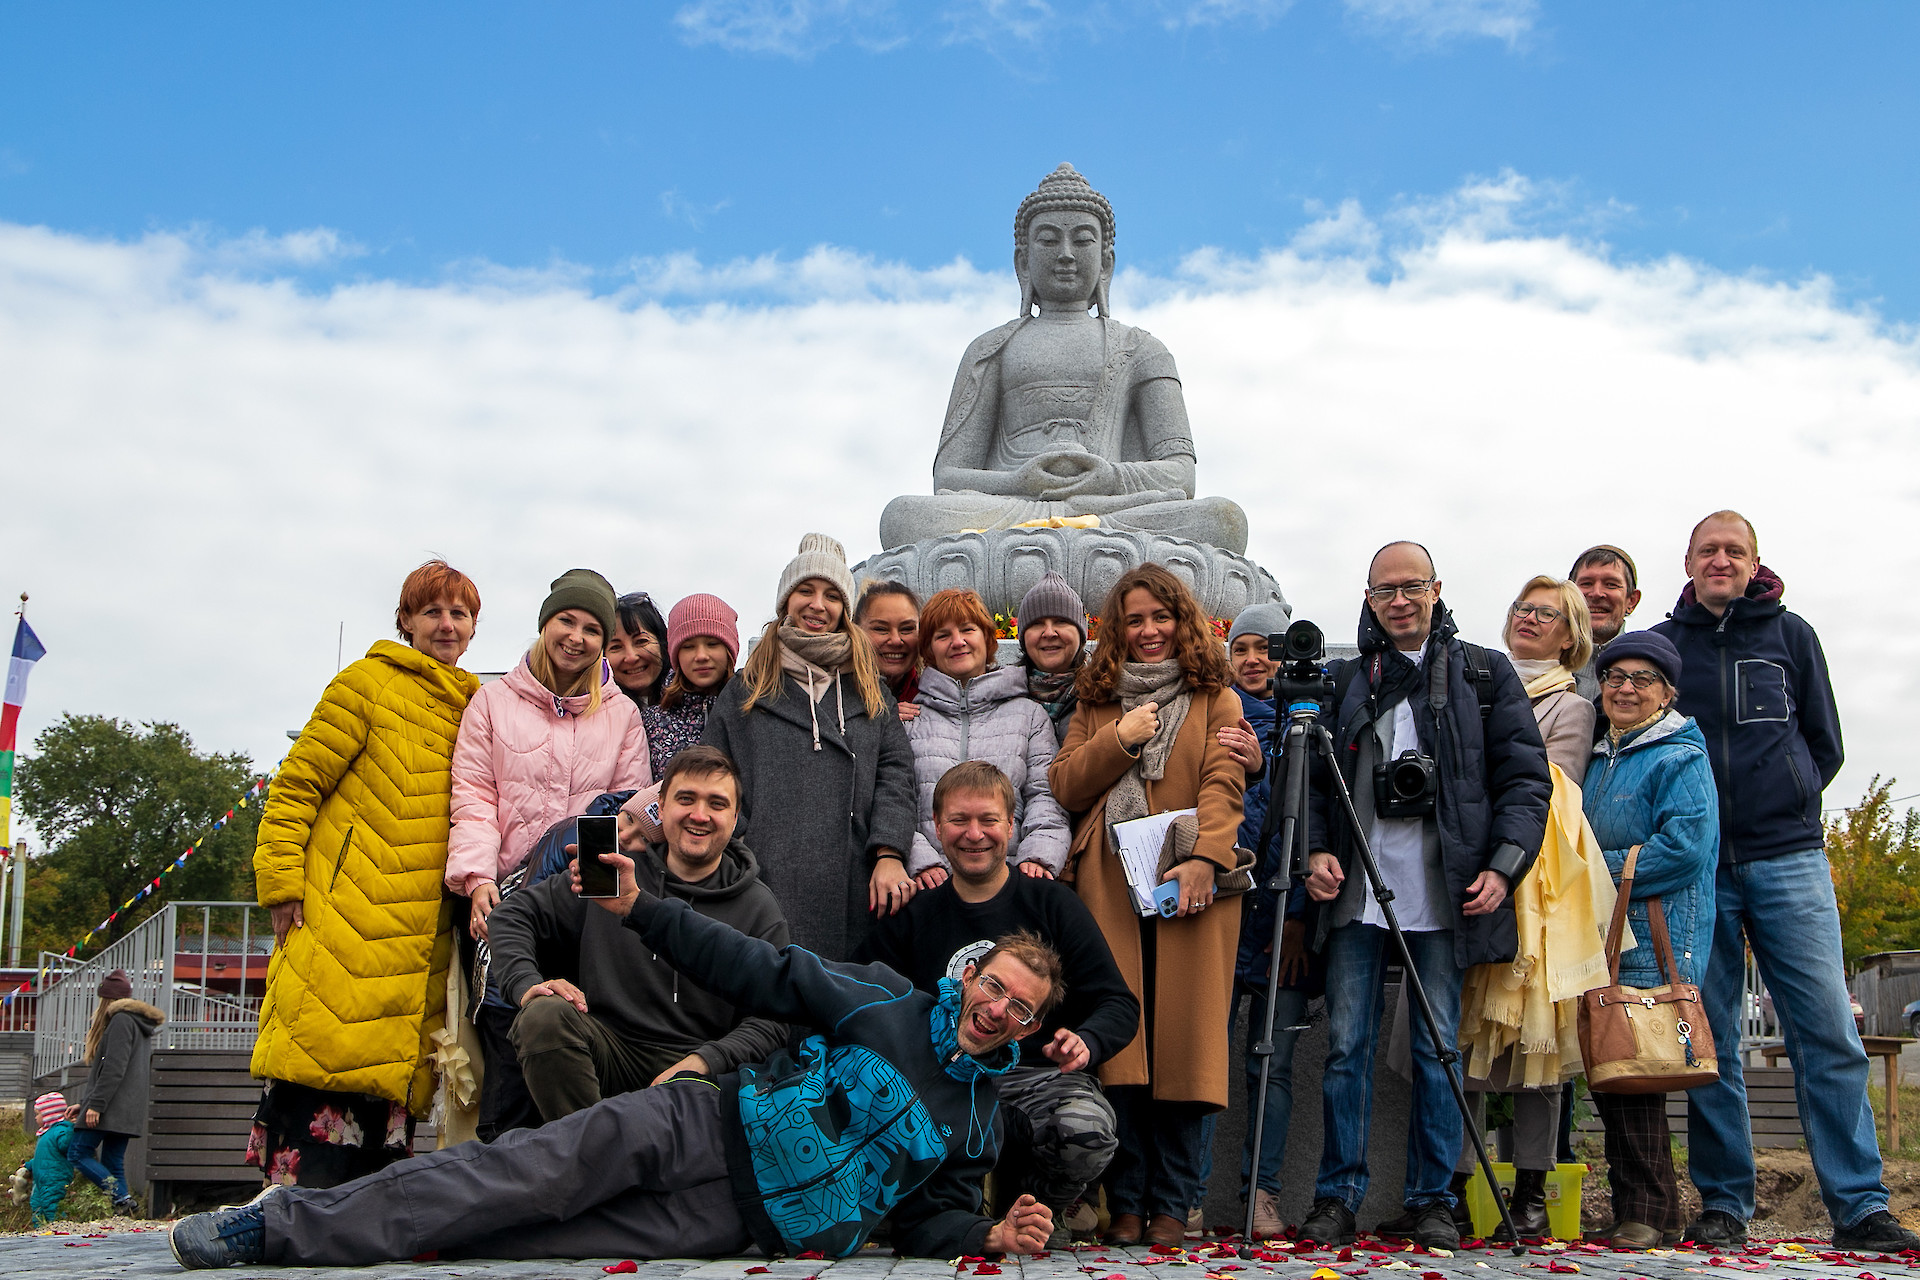 Ассоциация Карма Кагью возвела статую Будды в Красноярске